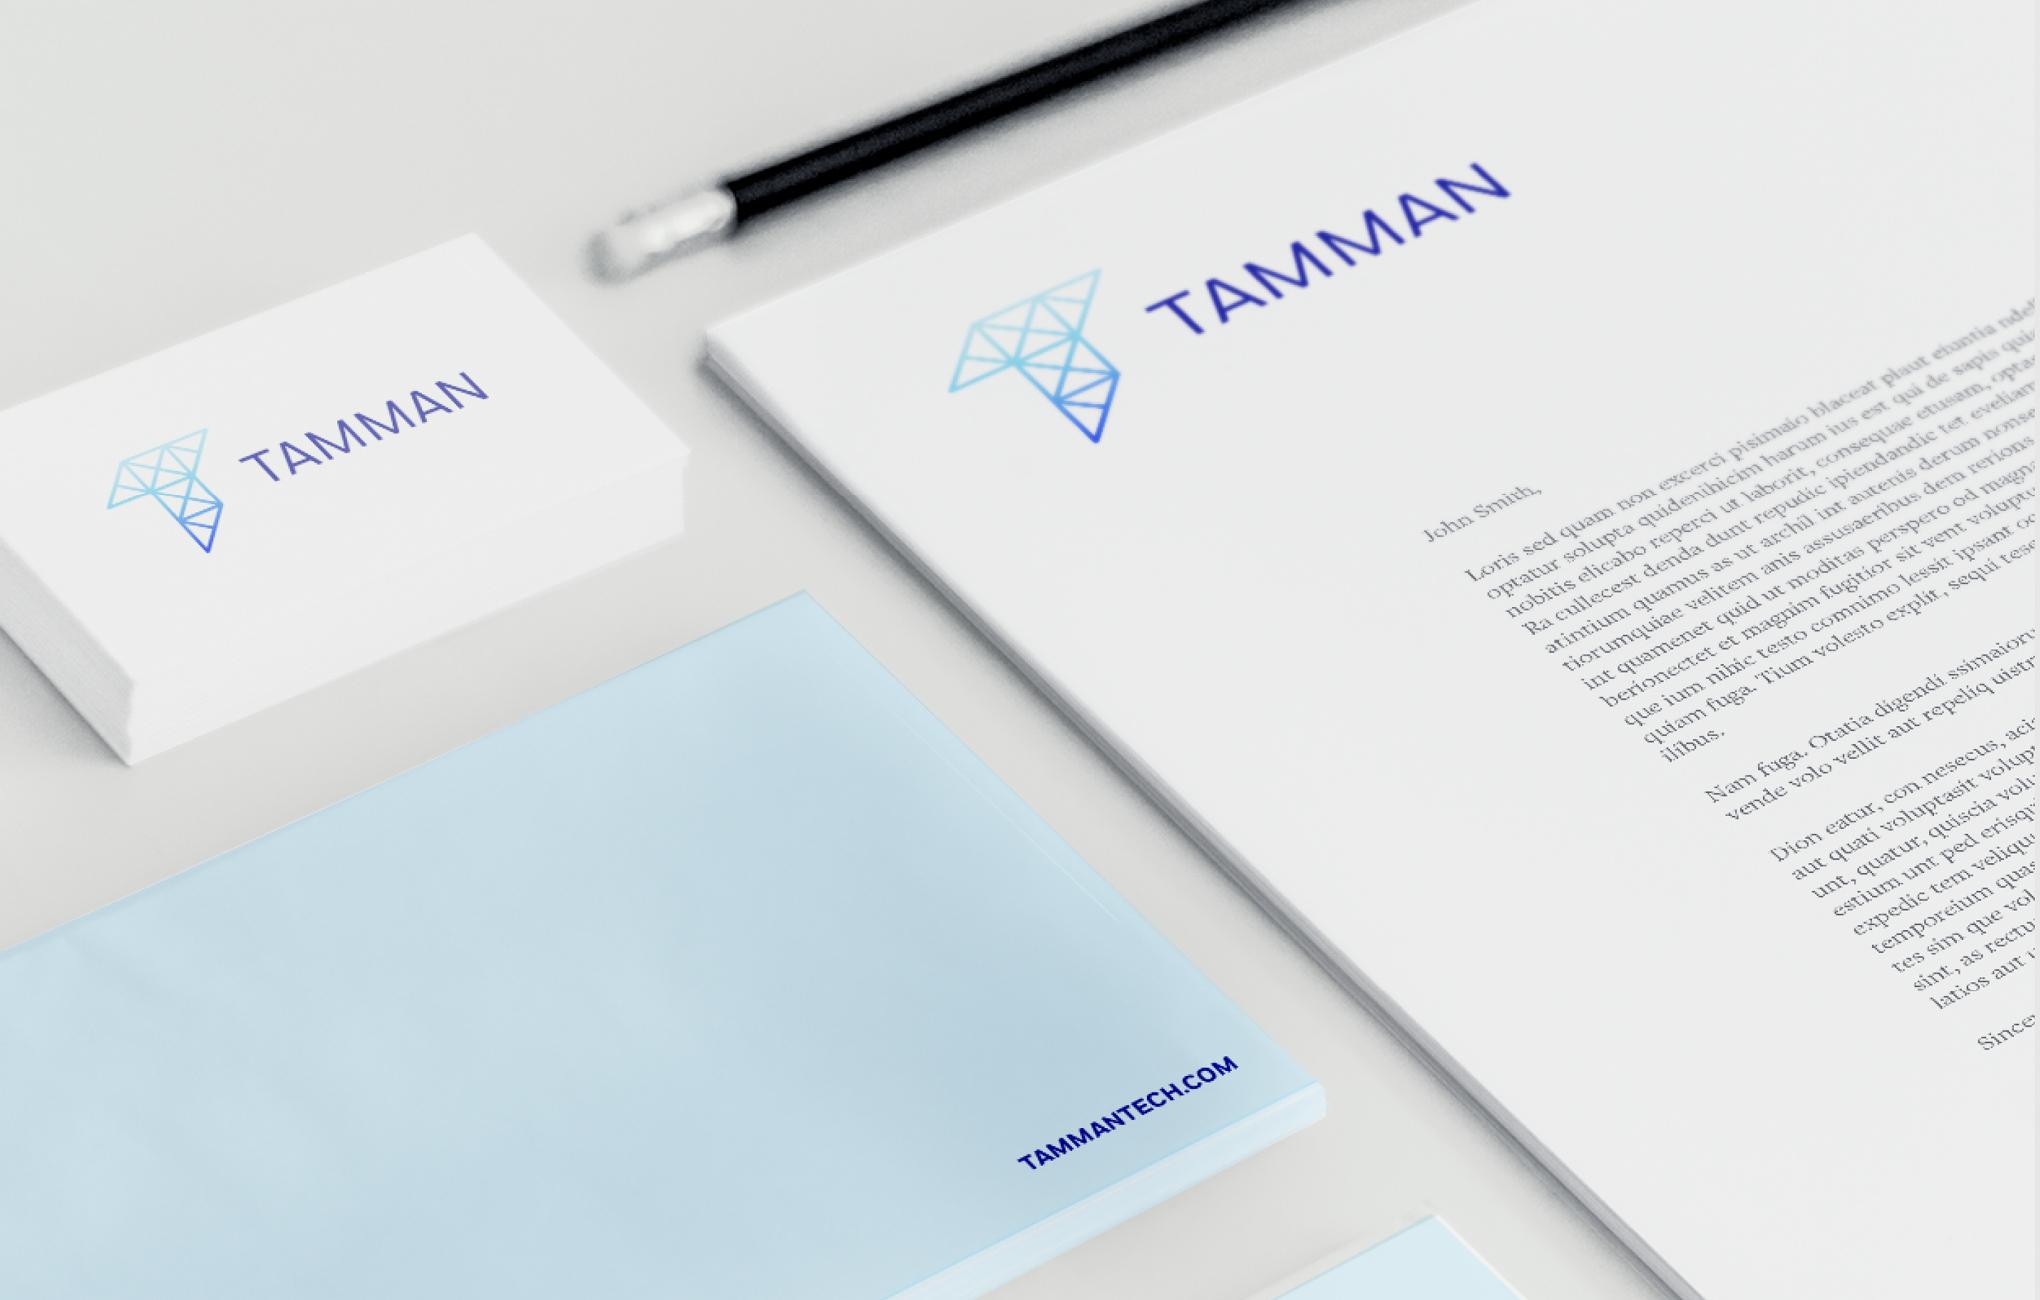 Tamman Technologies